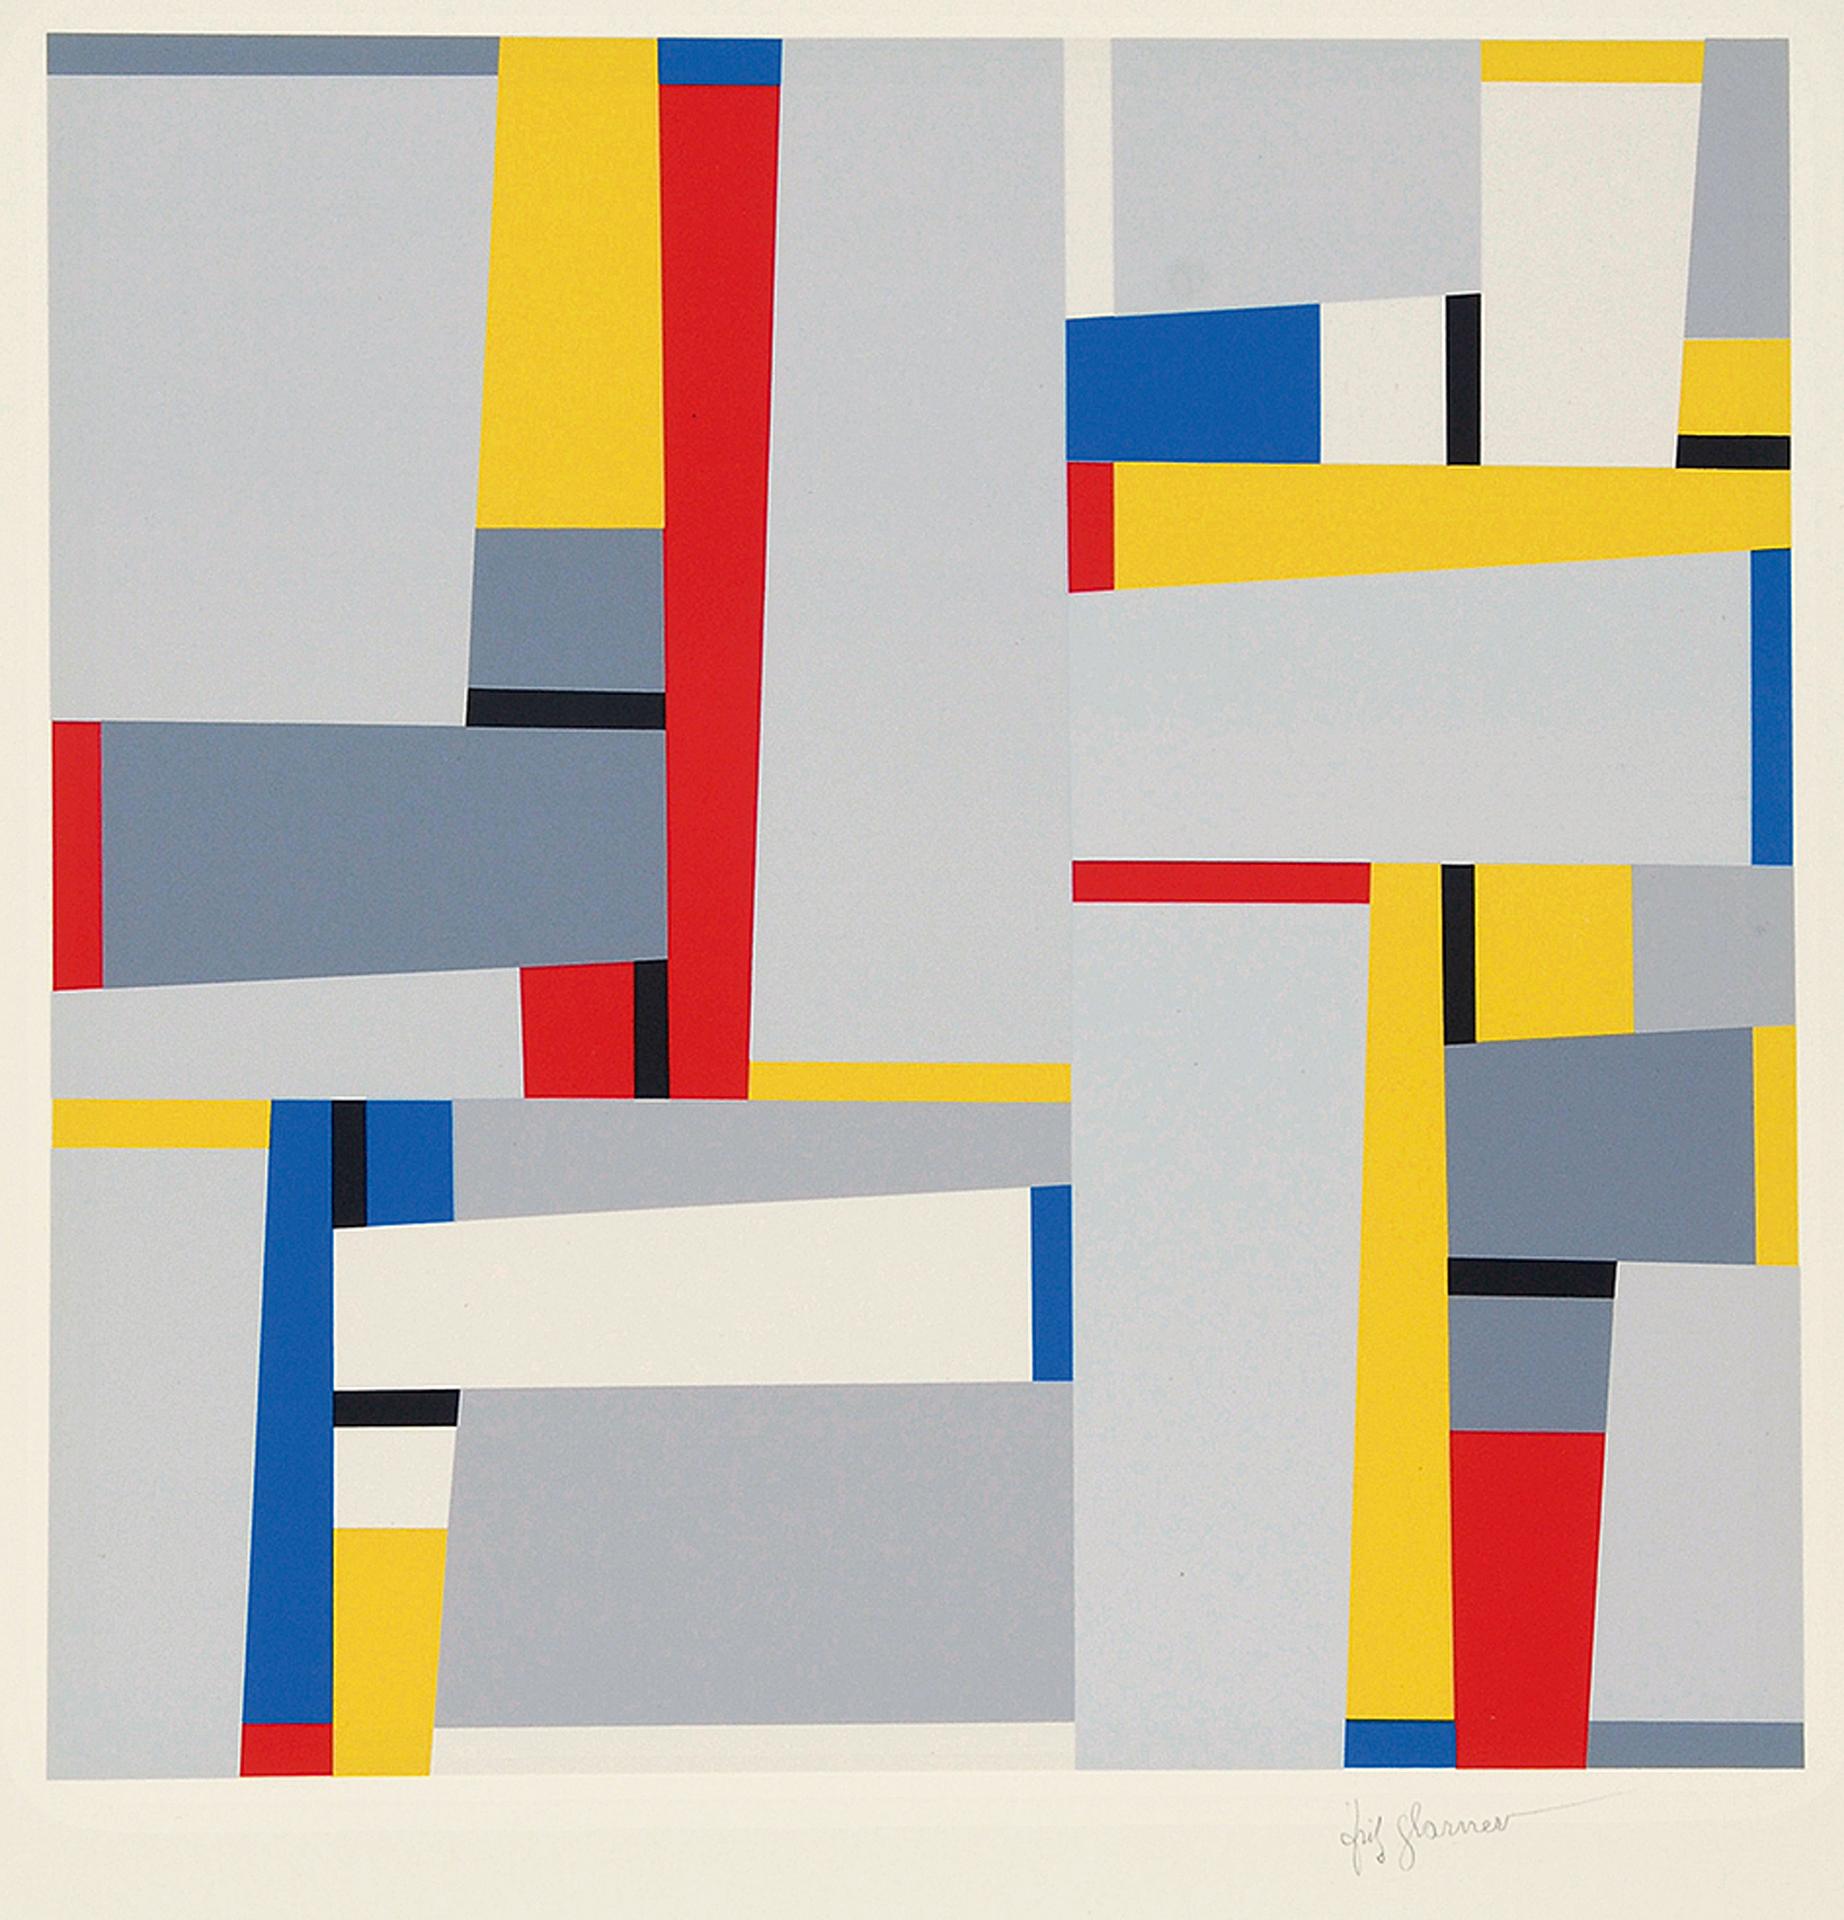 Glarner Fritz, Relation Painting Nr. 96